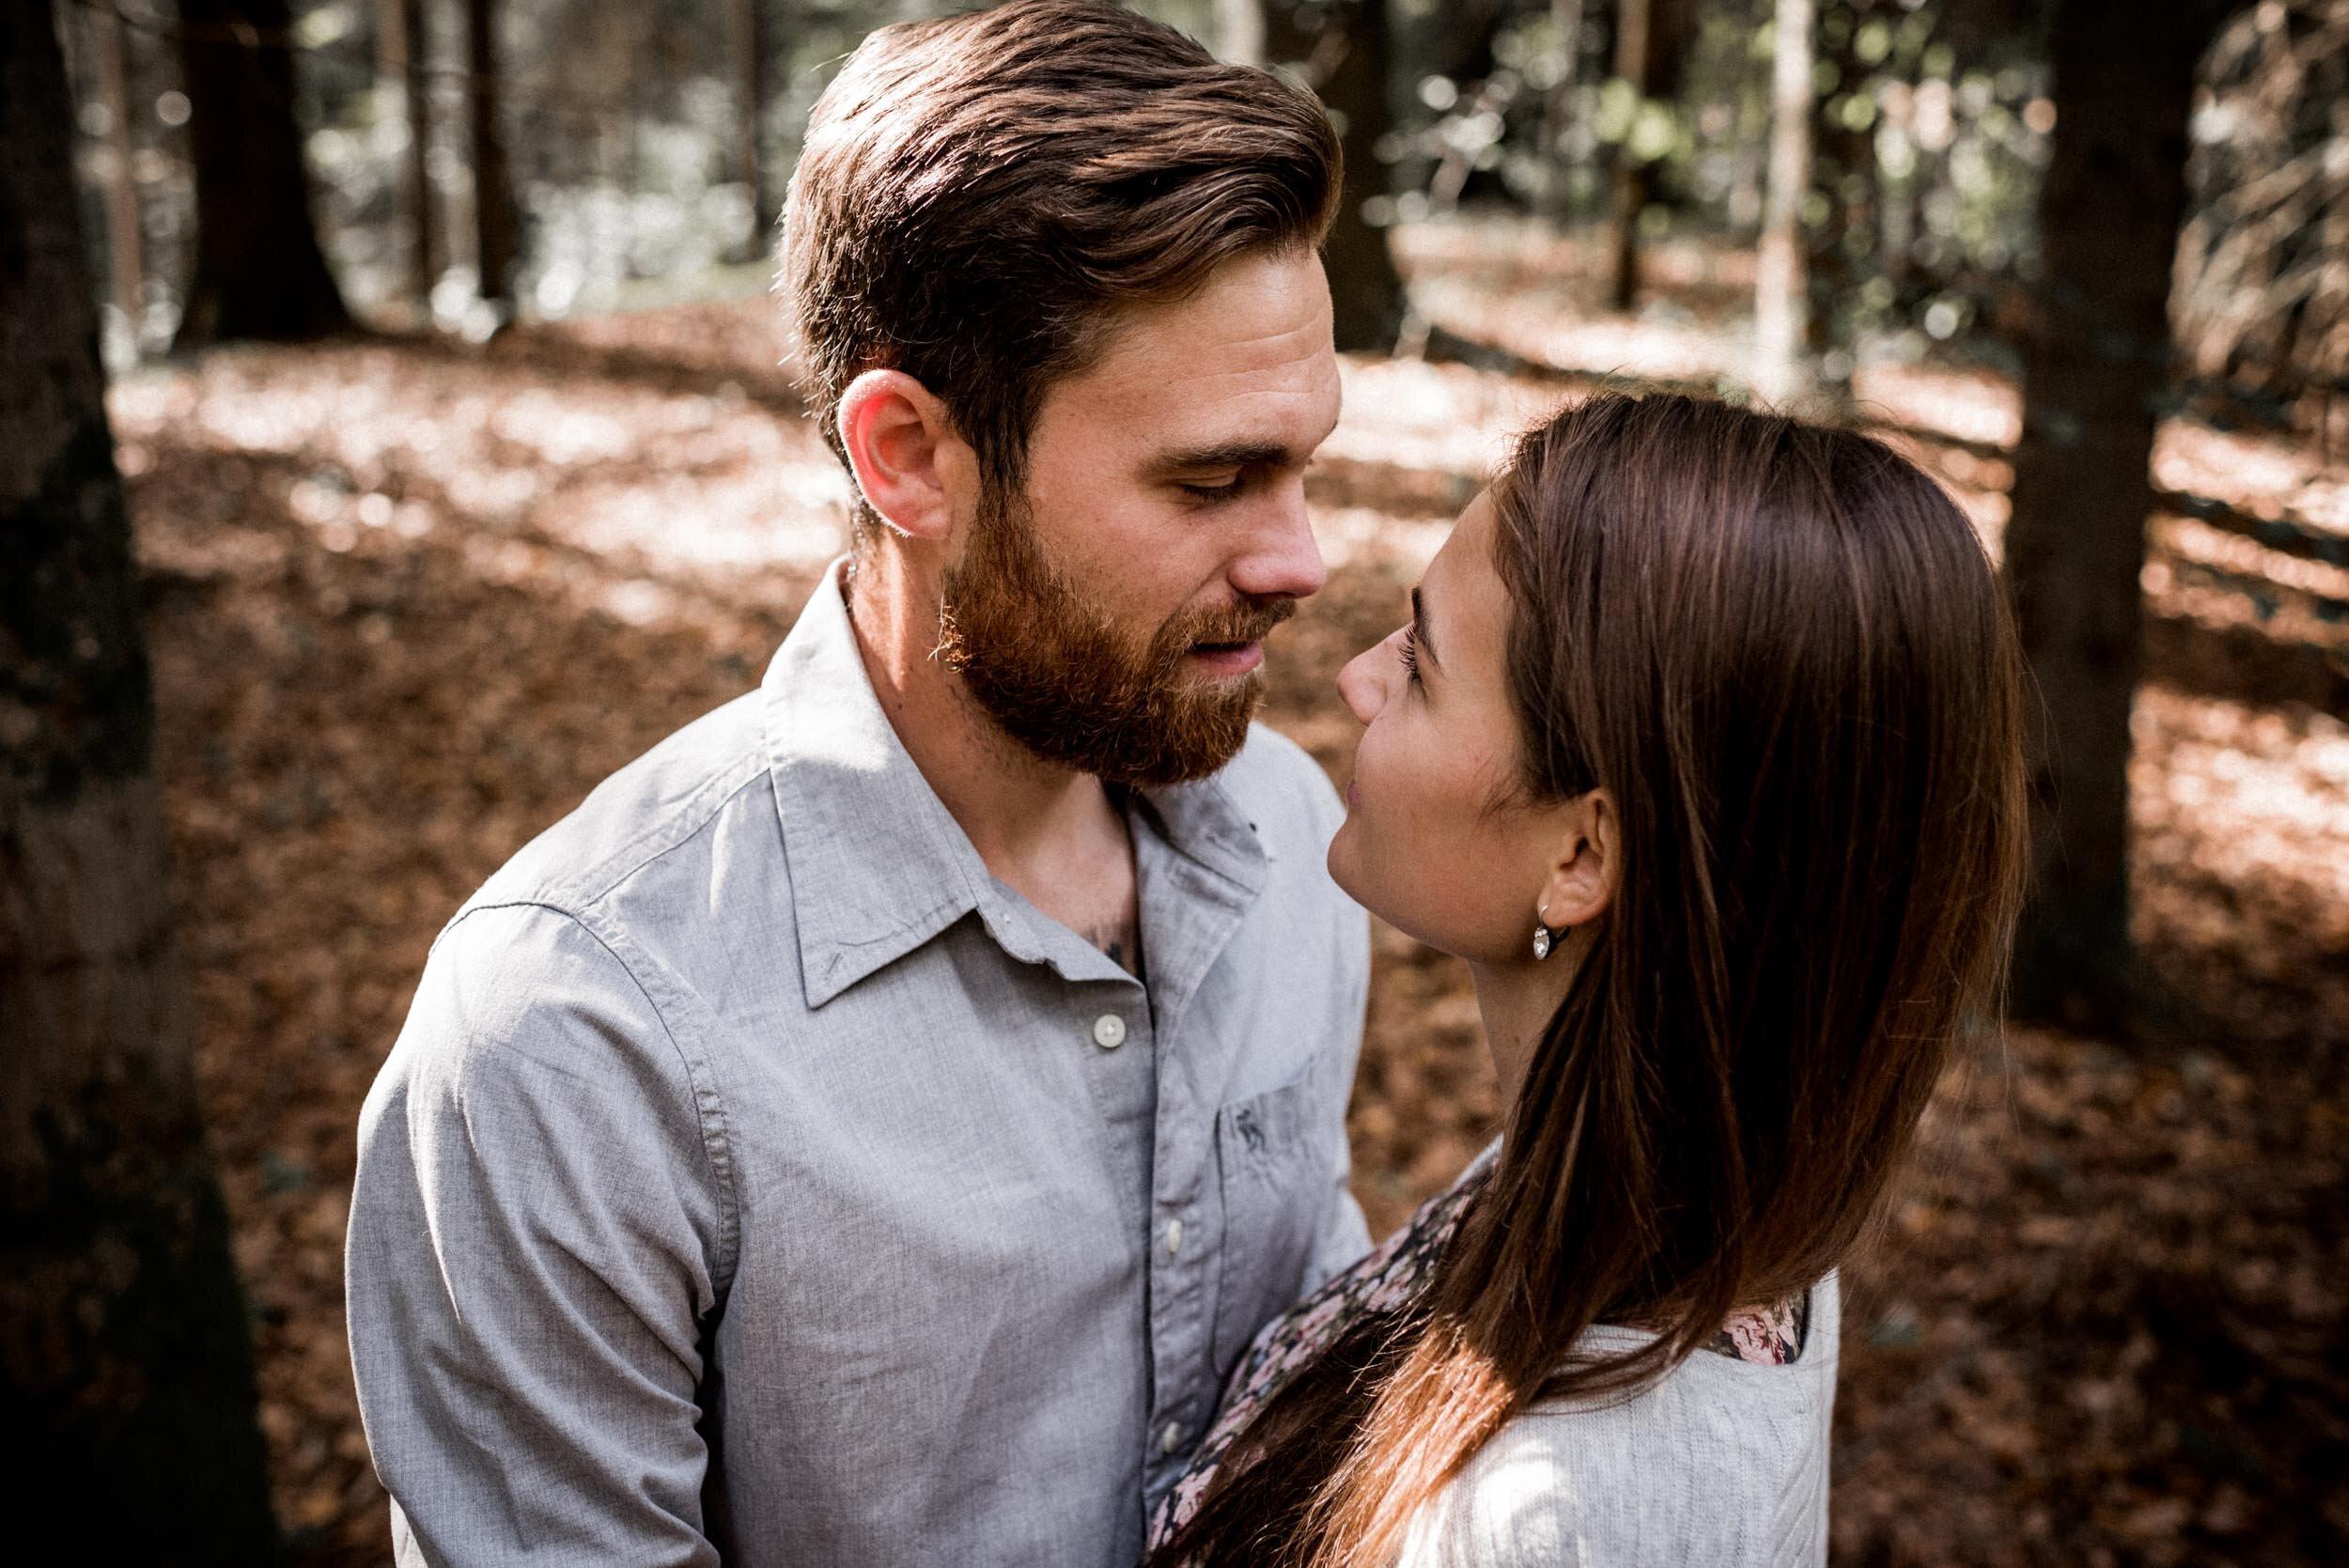 Couple-Shooting_2019_10.jpg